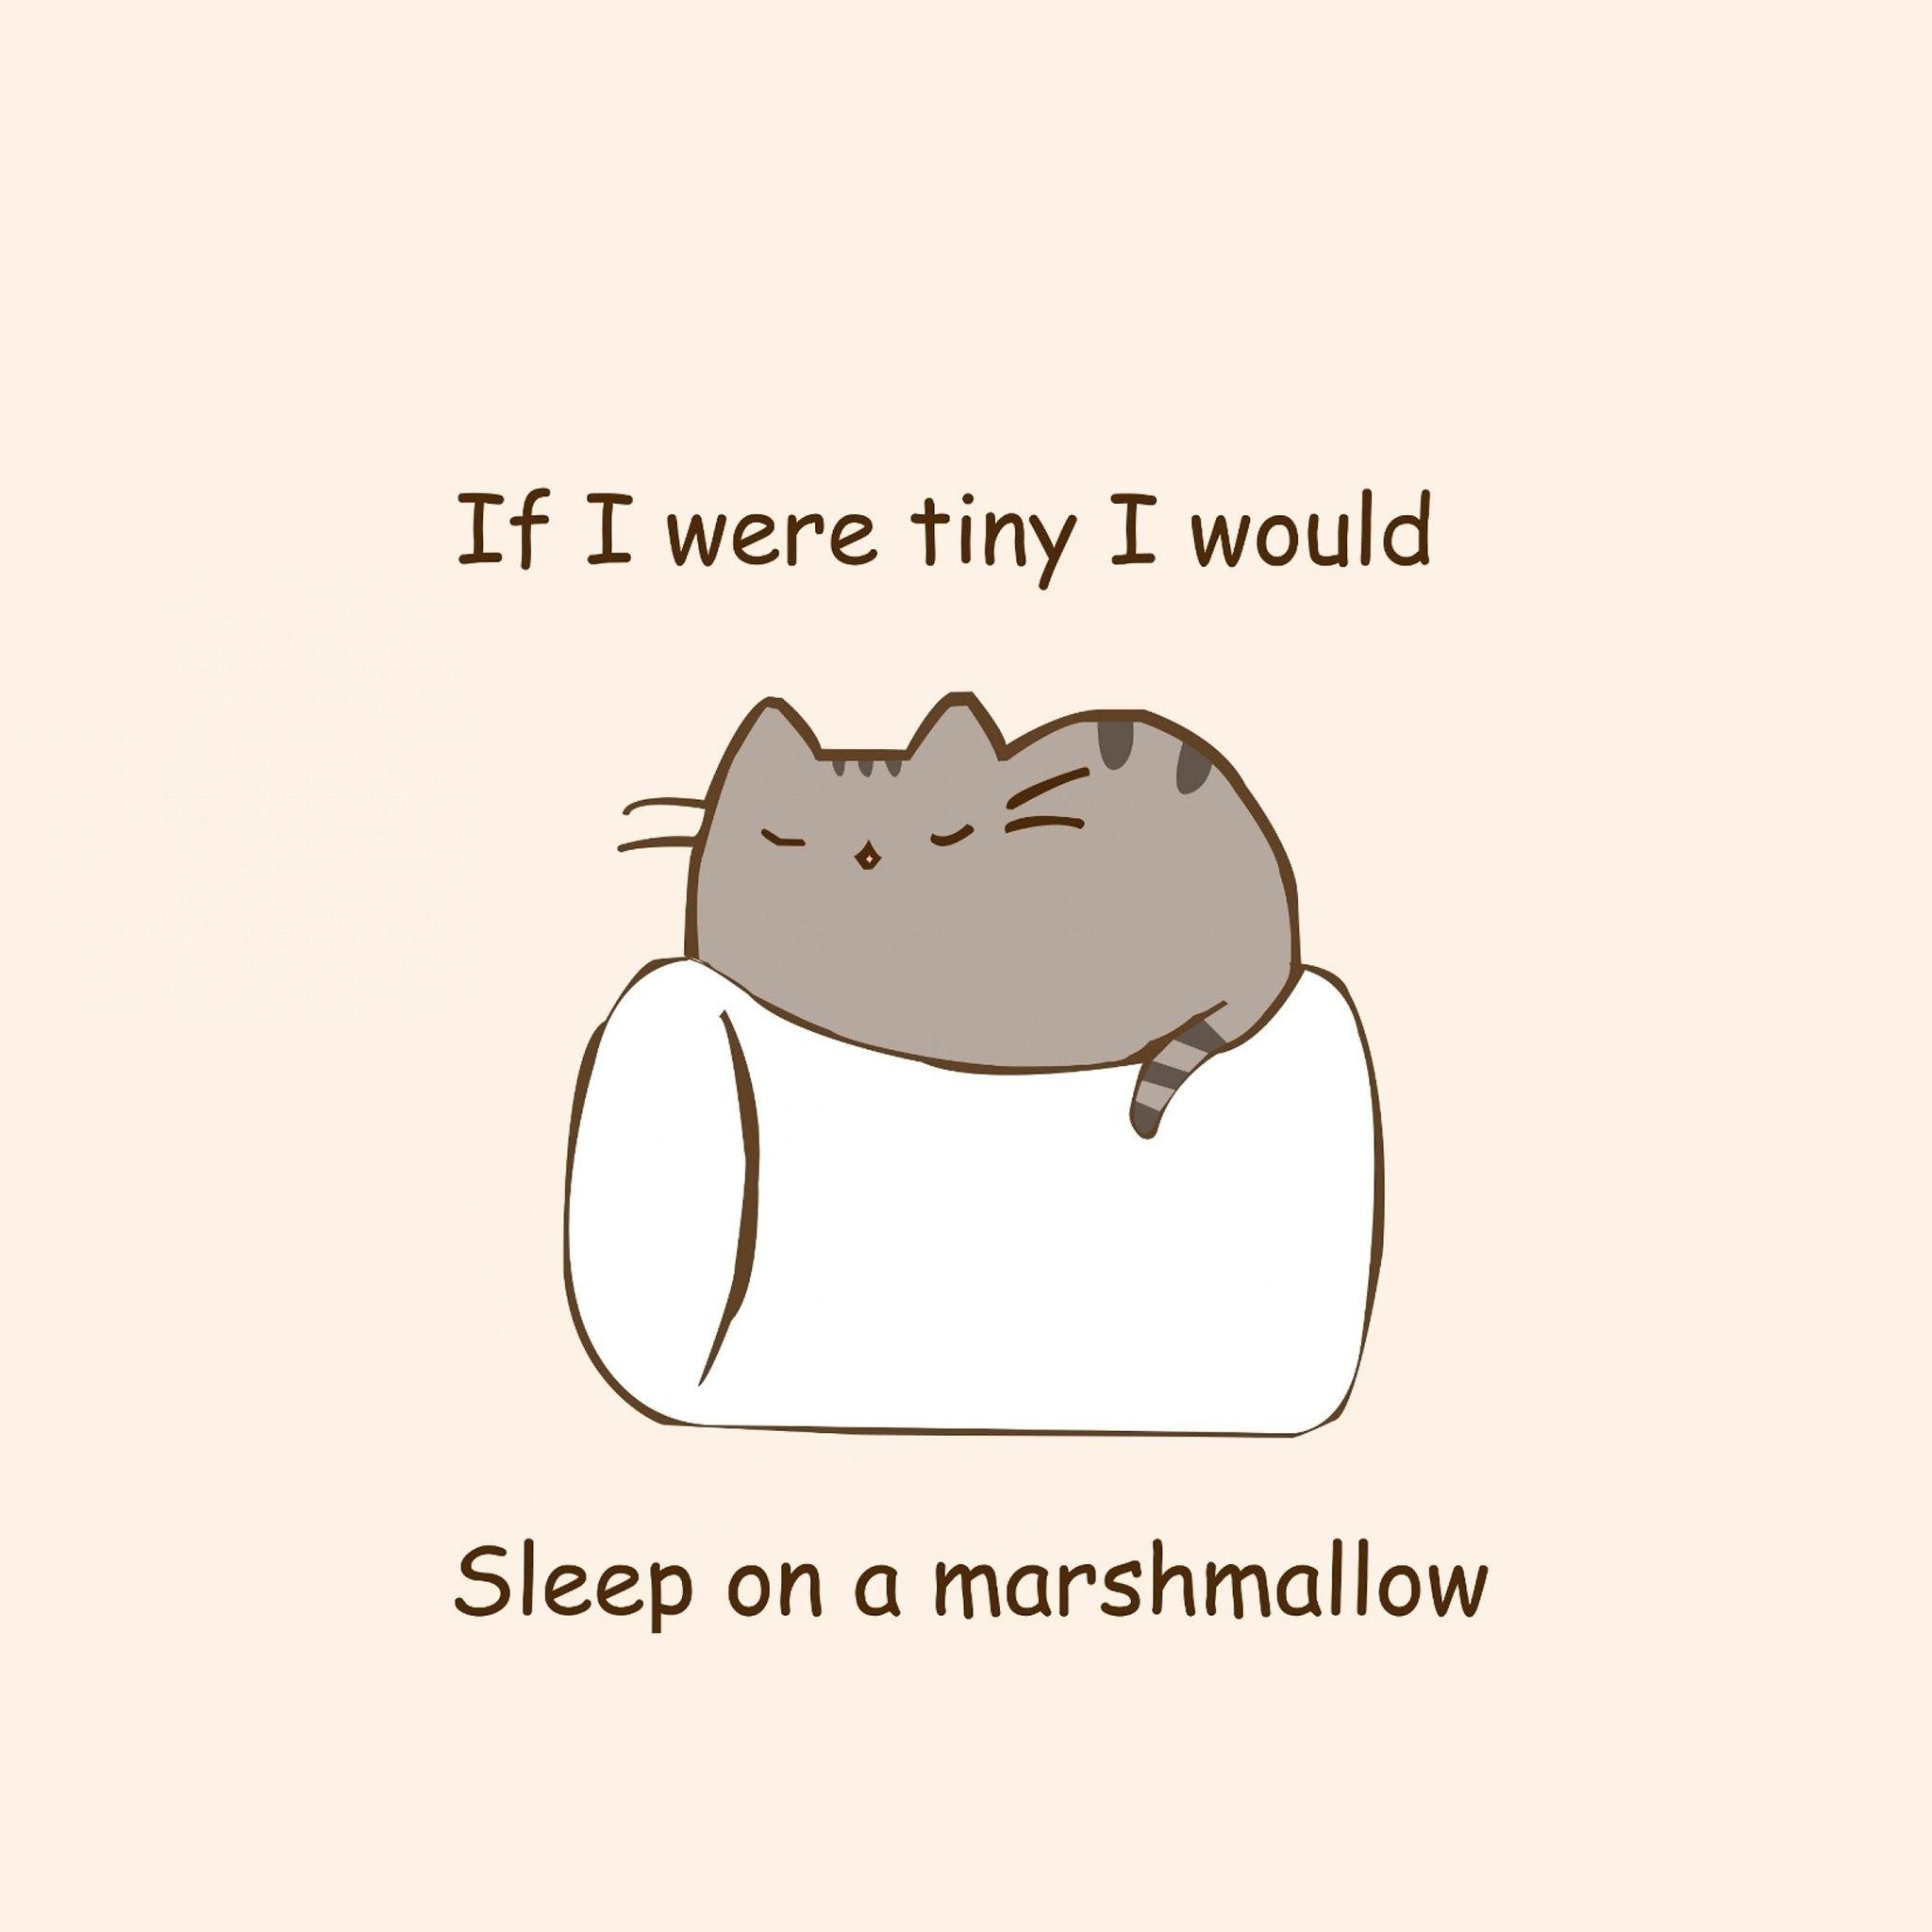 Pin By Kaitlin M On My Things Pusheen Cat Pusheen Cute Cute Quotes